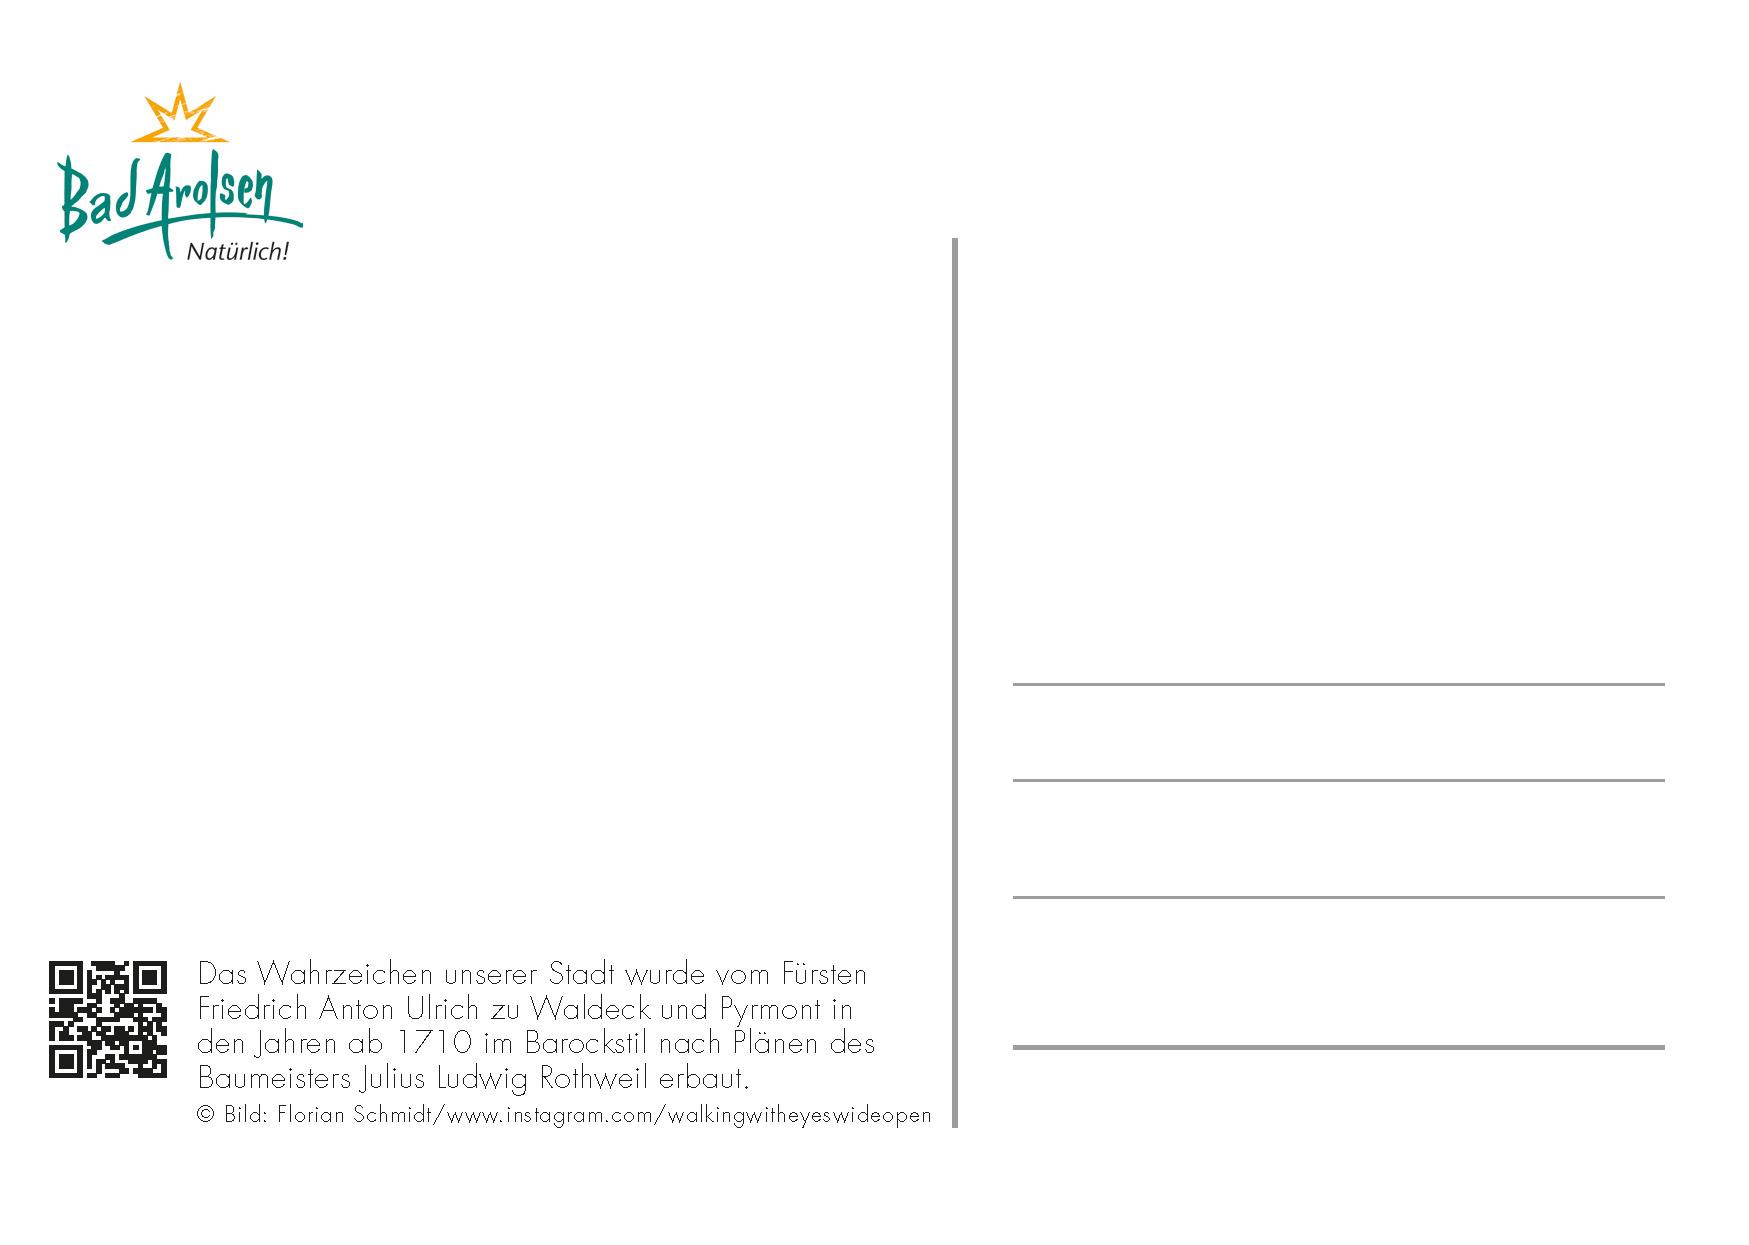 Dichter-Postkarte Rückseite Bad Arolsen